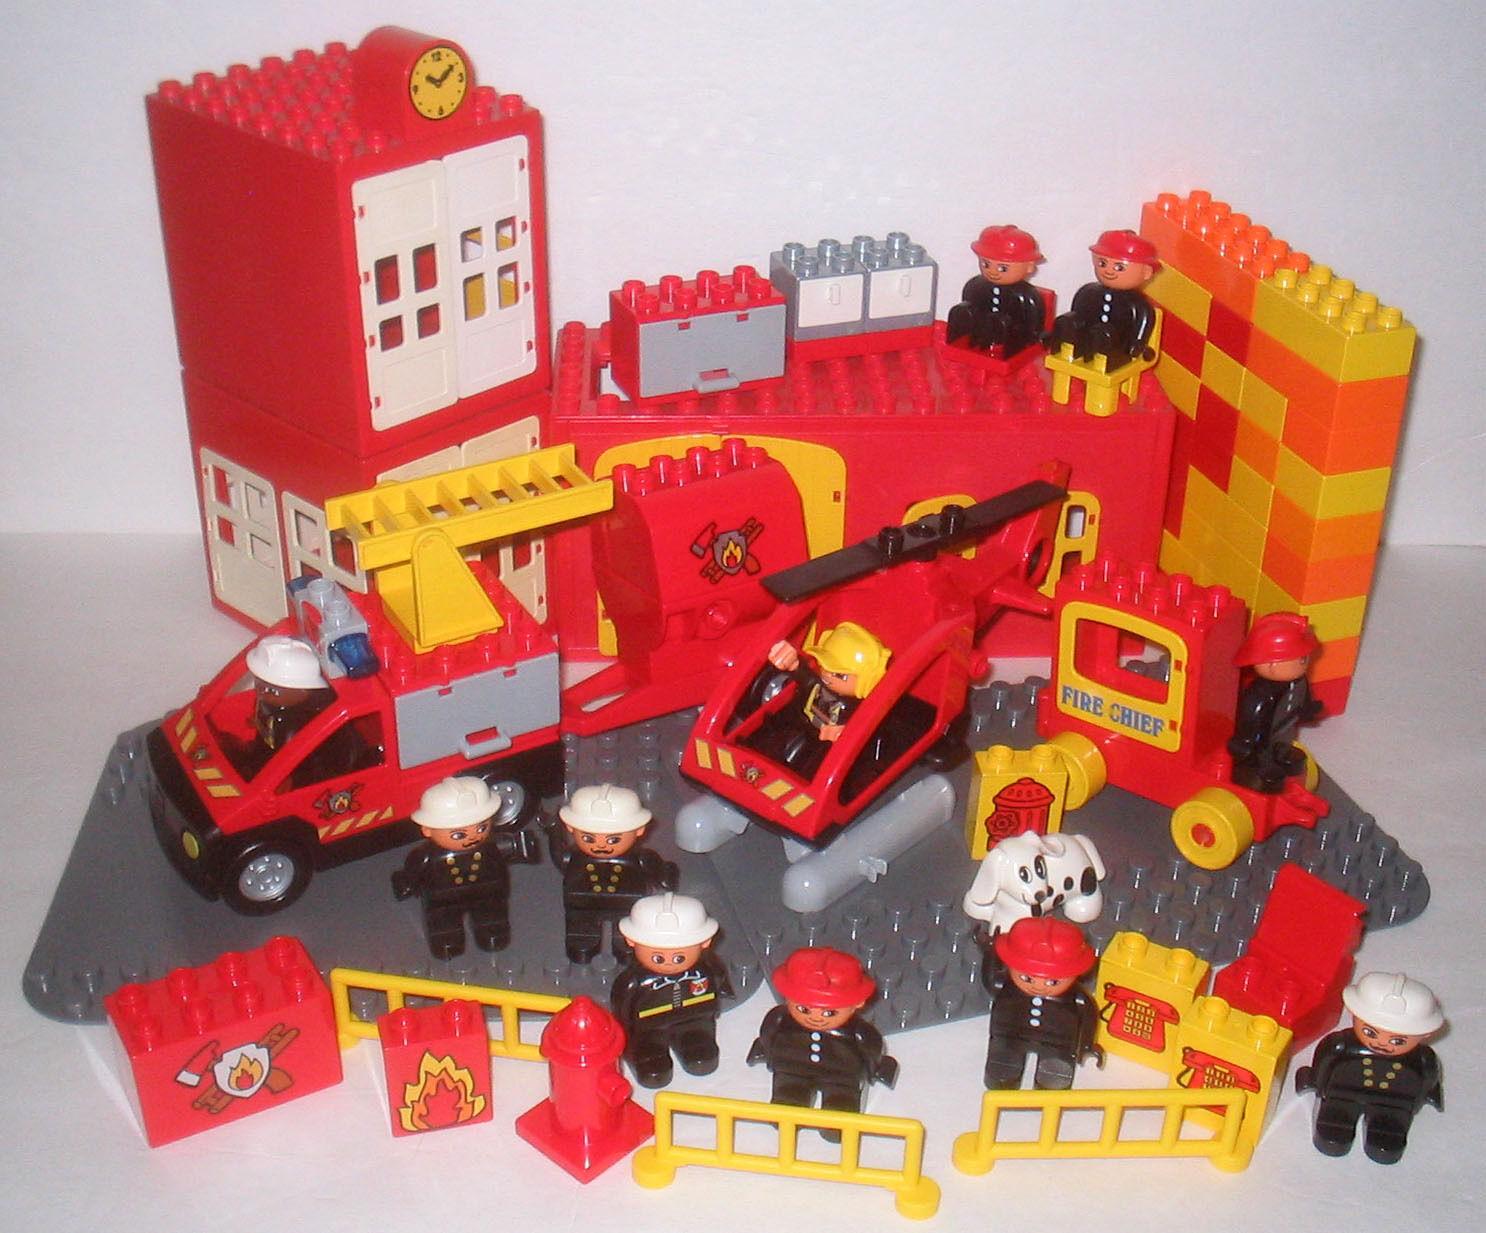 Fourni Nnyrni1702 Pompiers Caserne Lot Duplo Jouets oeWBdrCx